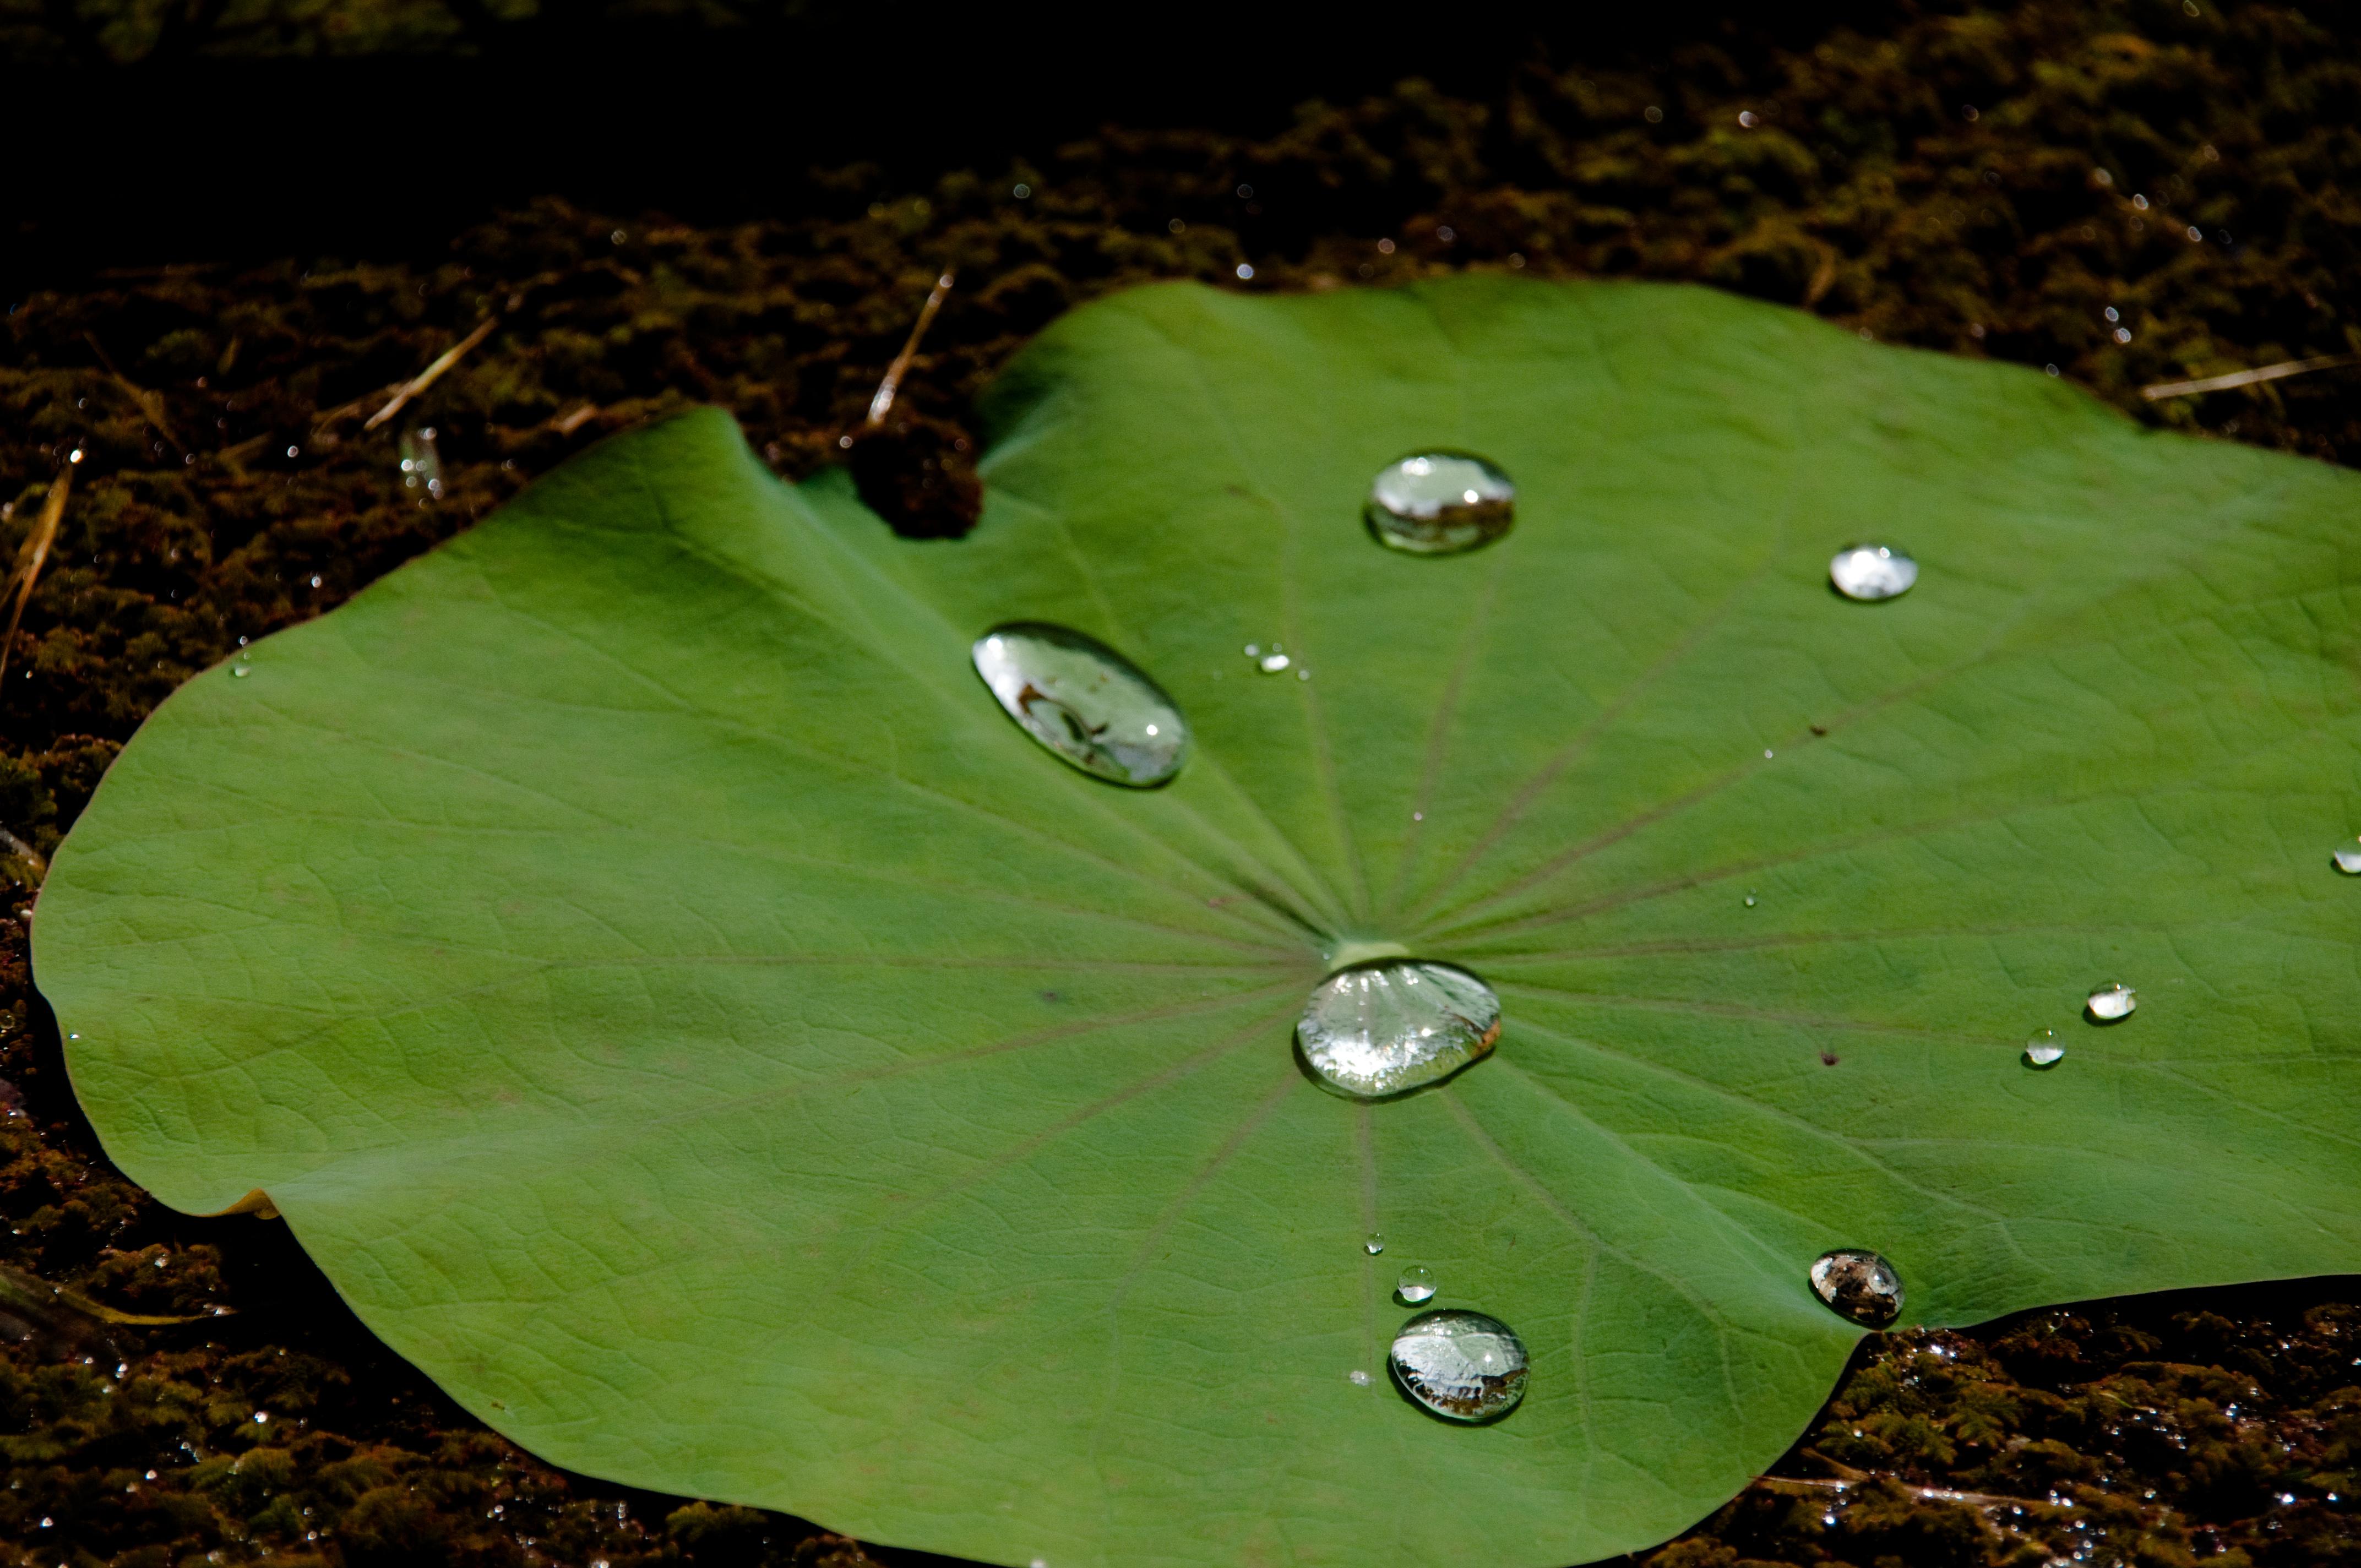 File:Lotus leaf with waterdrops.jpg - Wikimedia Commons